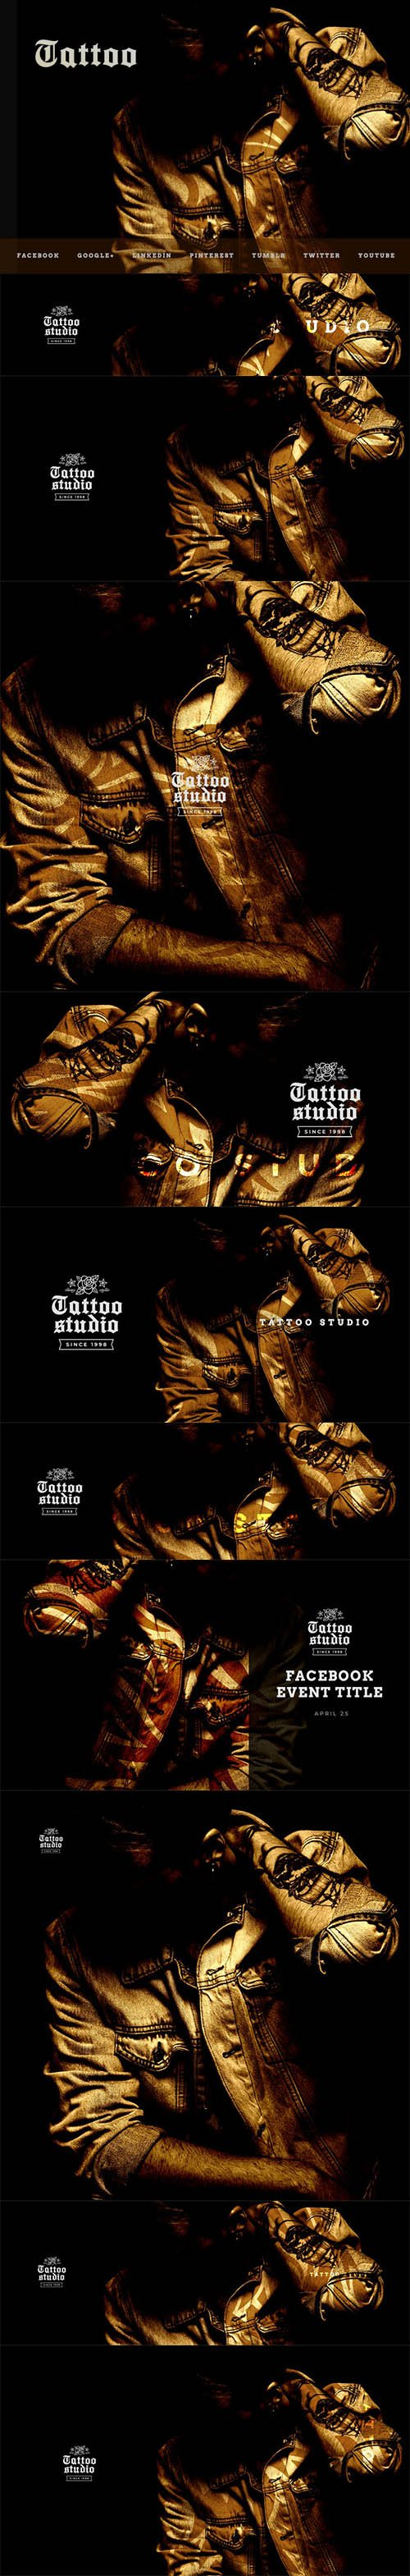 Tattoo Studio - Social Media Kit